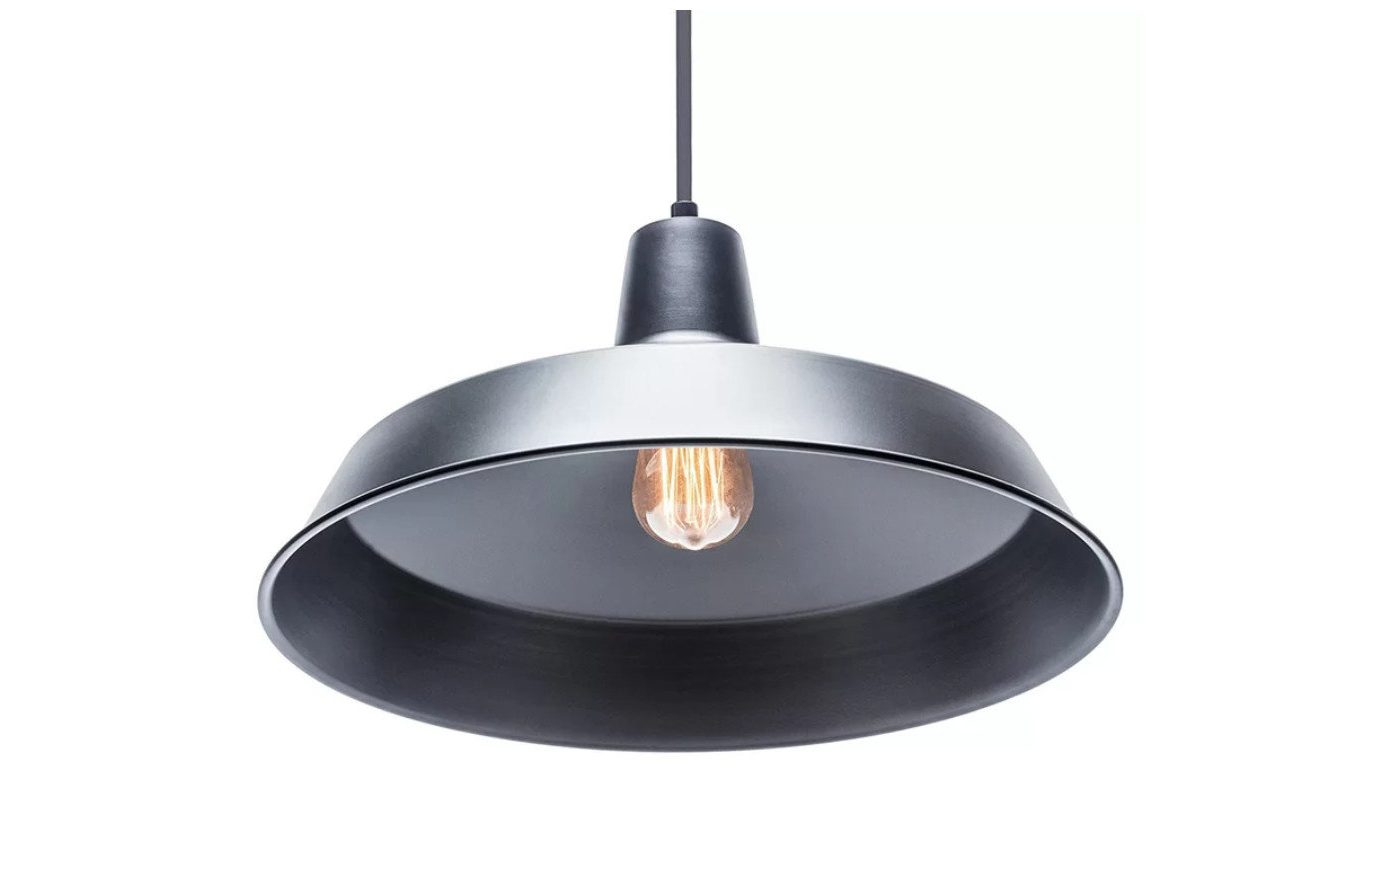 Style + Design Travel Shop light lighting light fixture product design ceiling fixture product lighting accessory